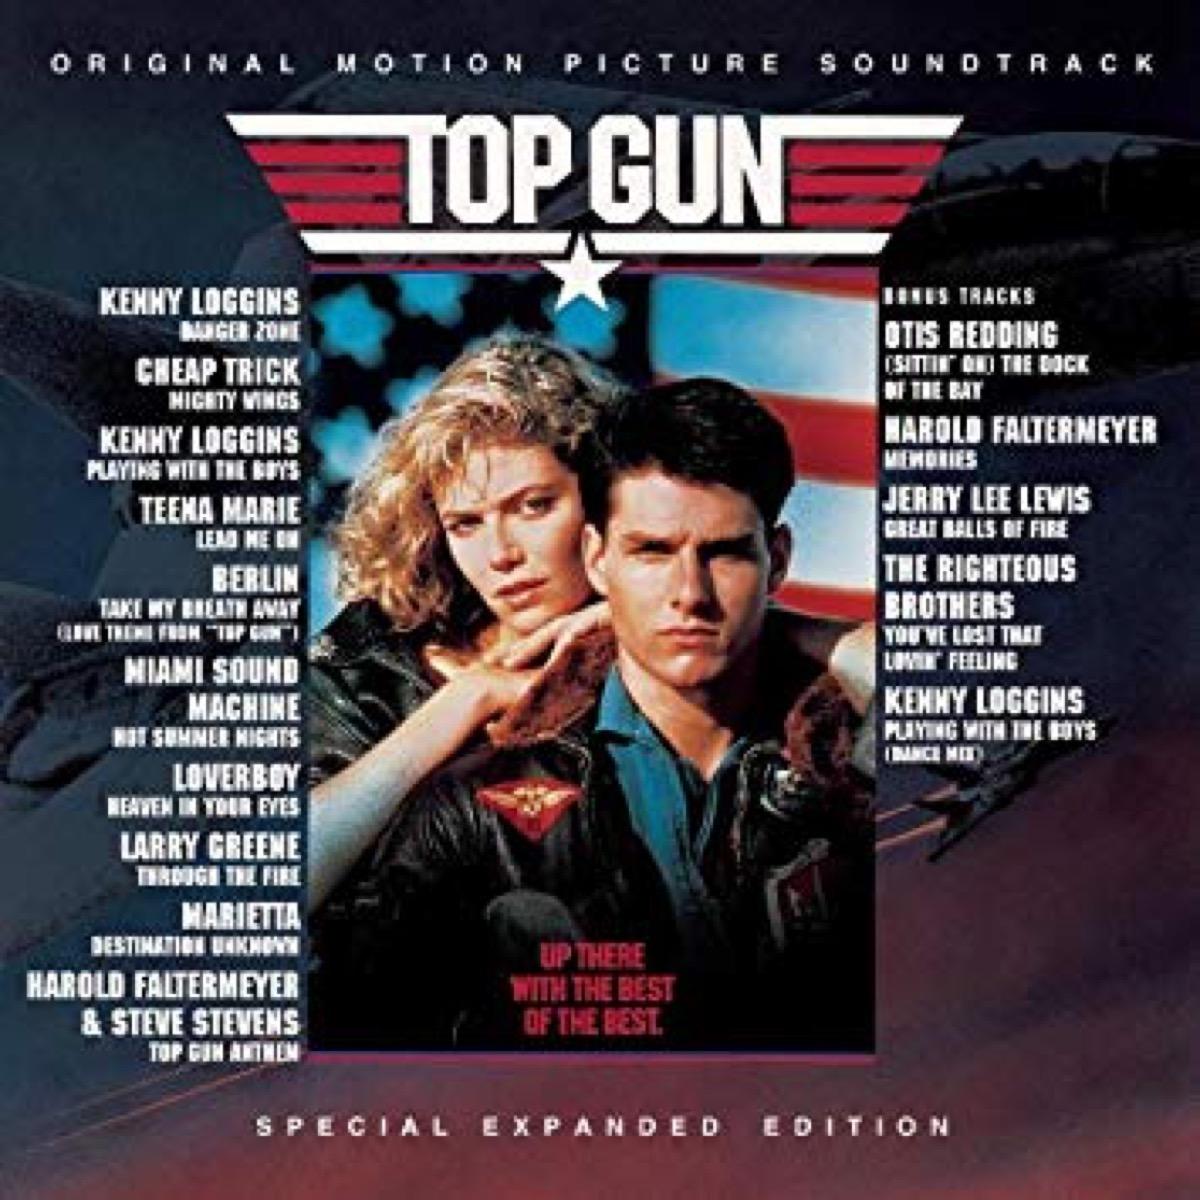 top gun movie soundtrack album cover